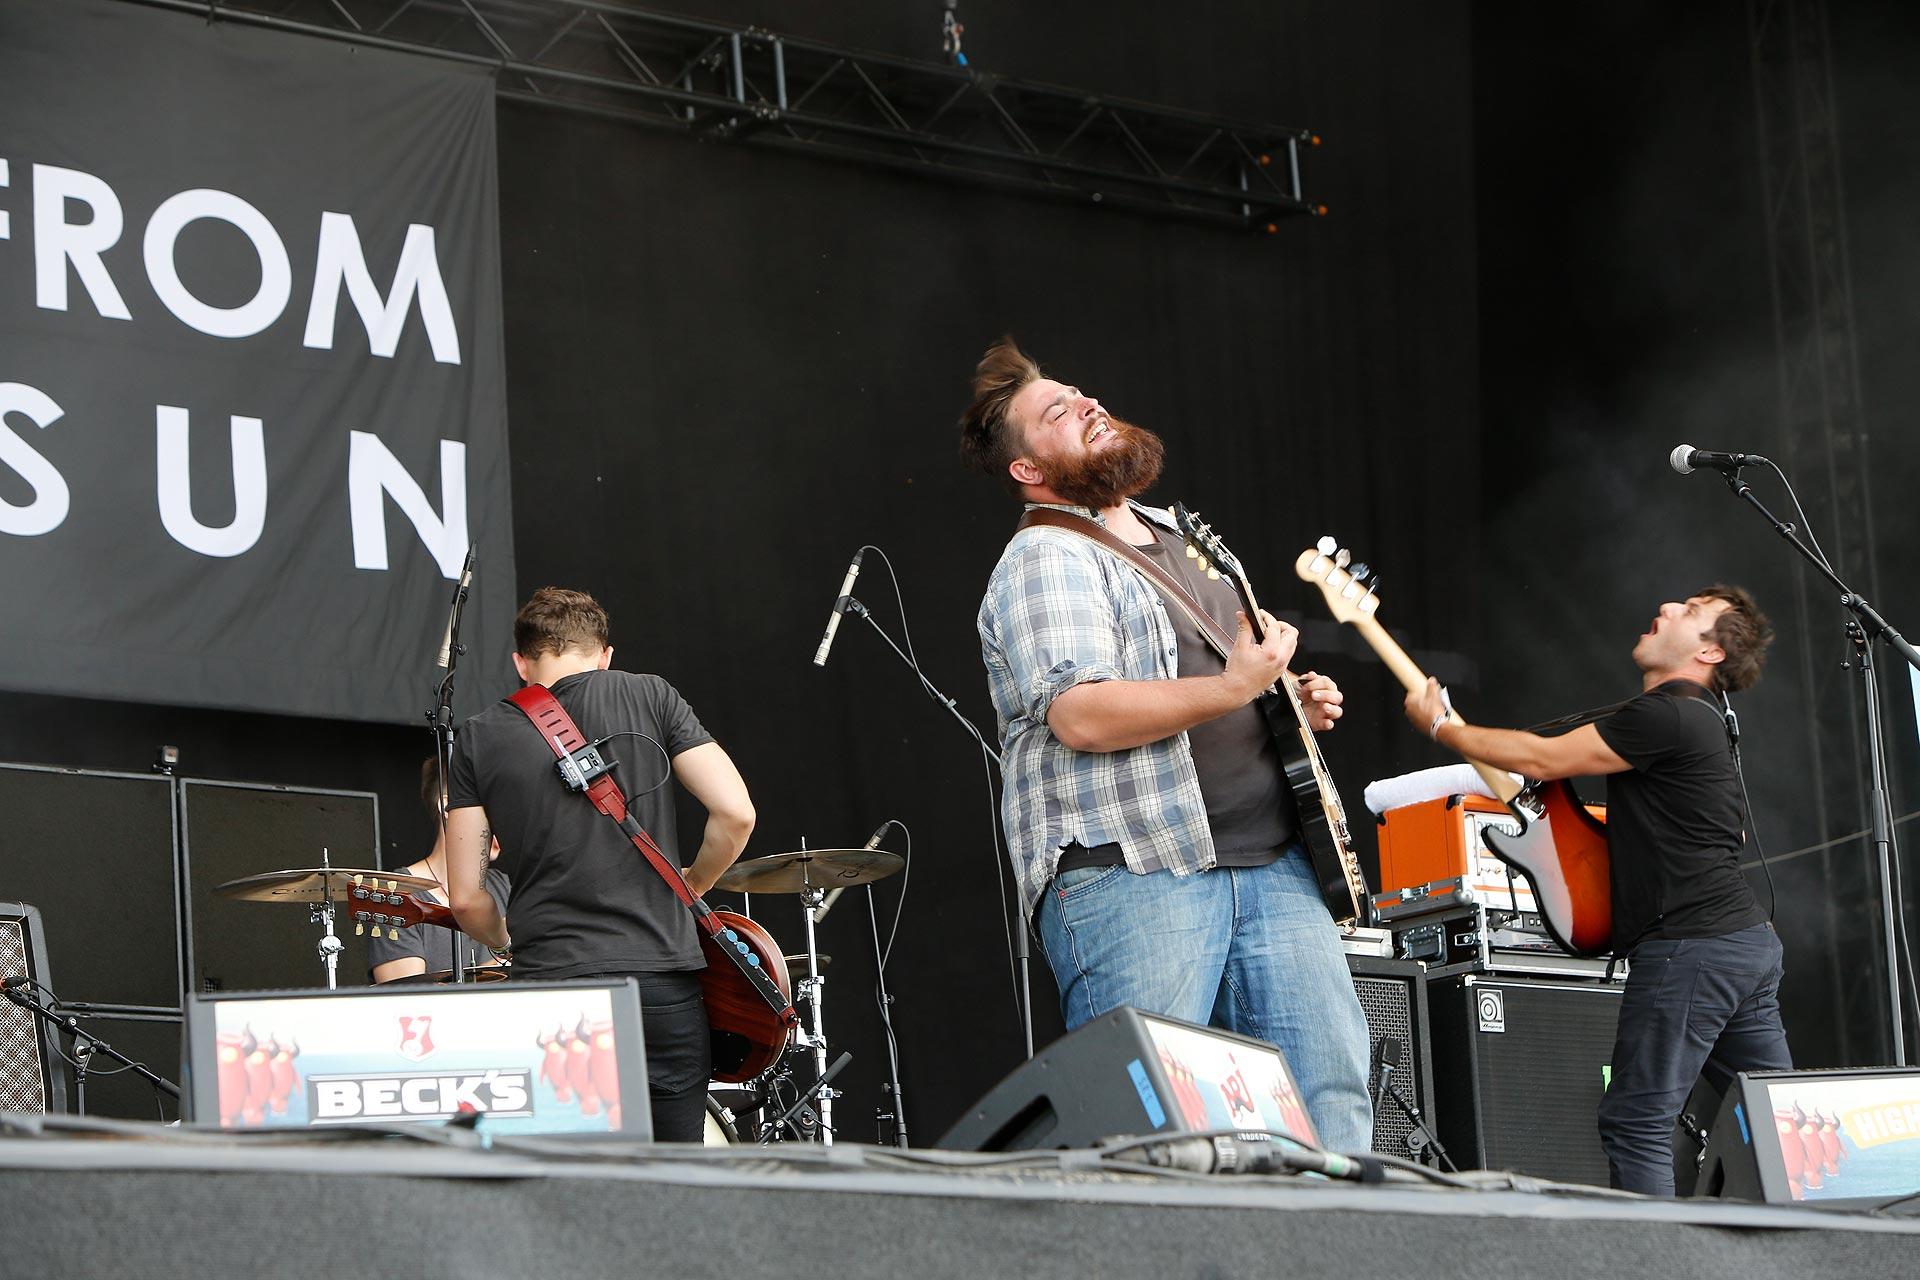 Nachwuchs mit Potential: die Leipziger Rockband I come from the sun